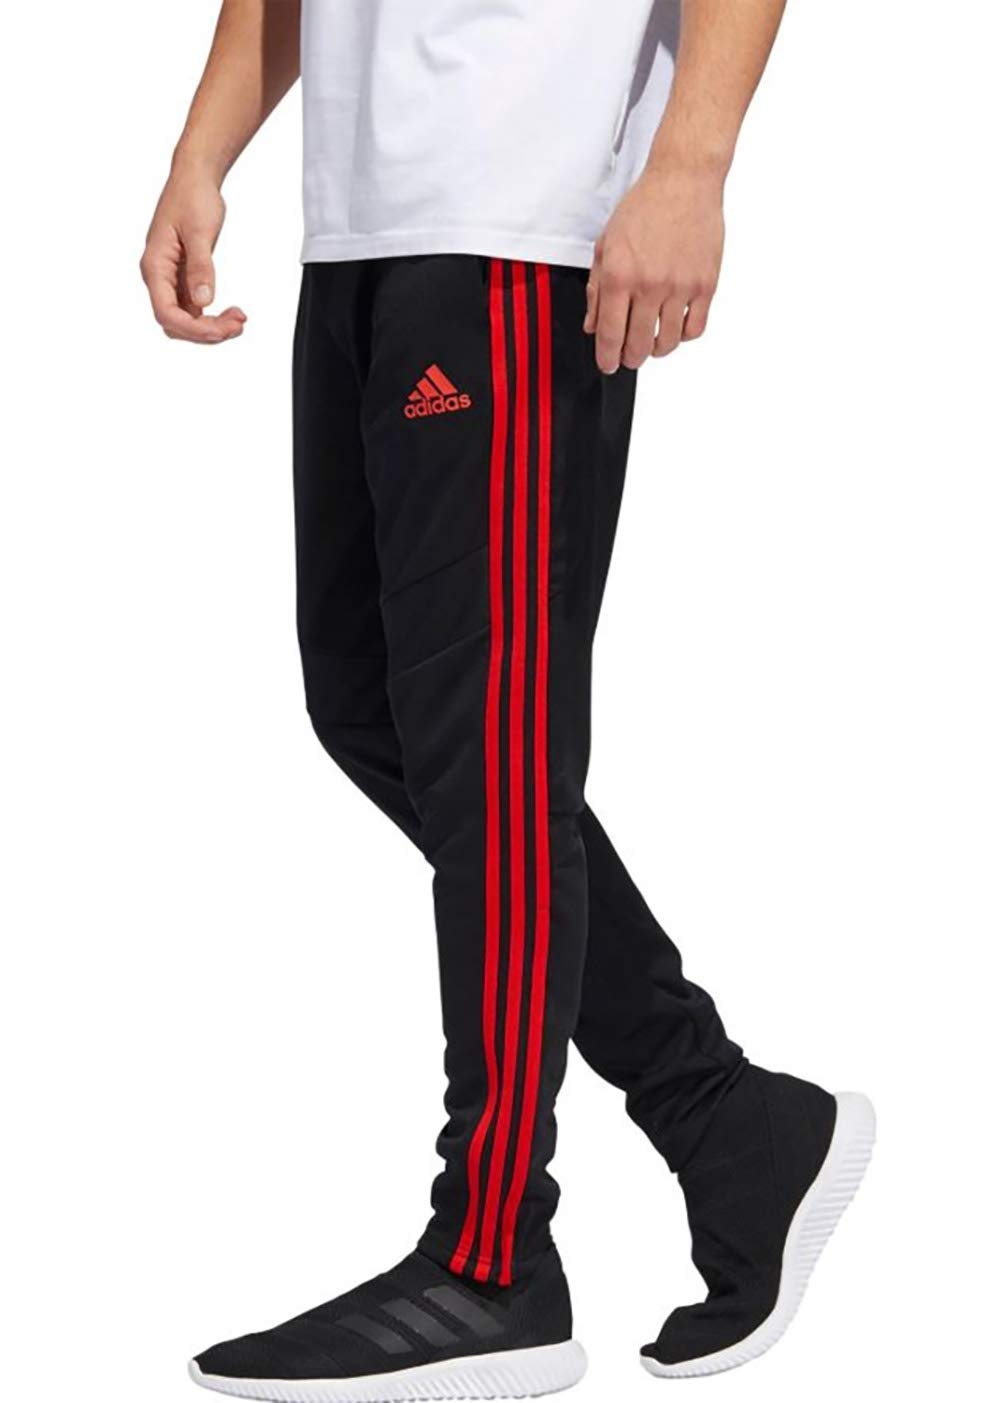 adidas Men's Tiro19 Training Pants, Black/Red, Medium by adidas